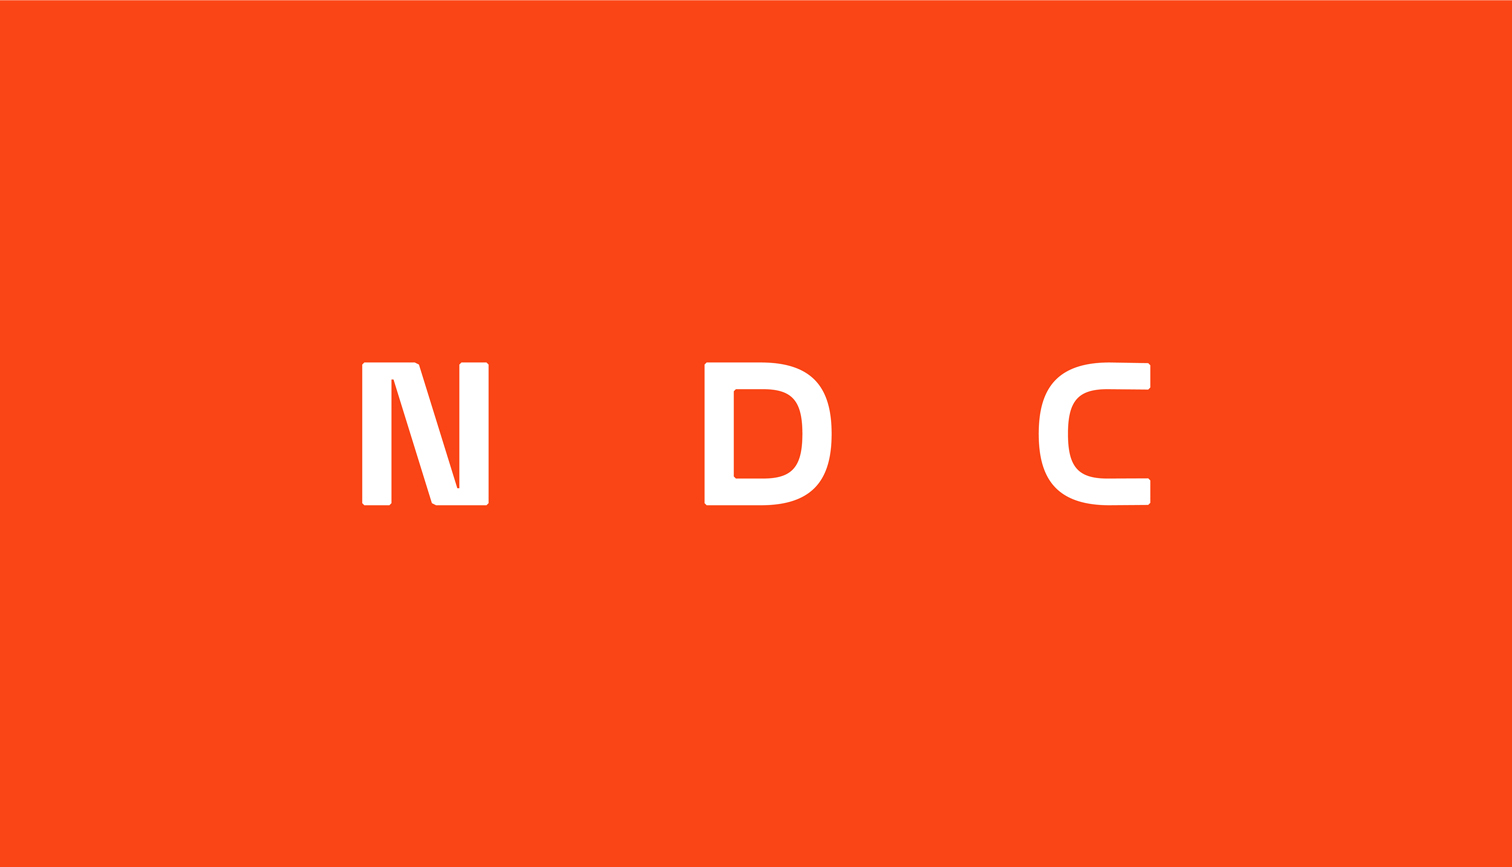 NDC-logotipo